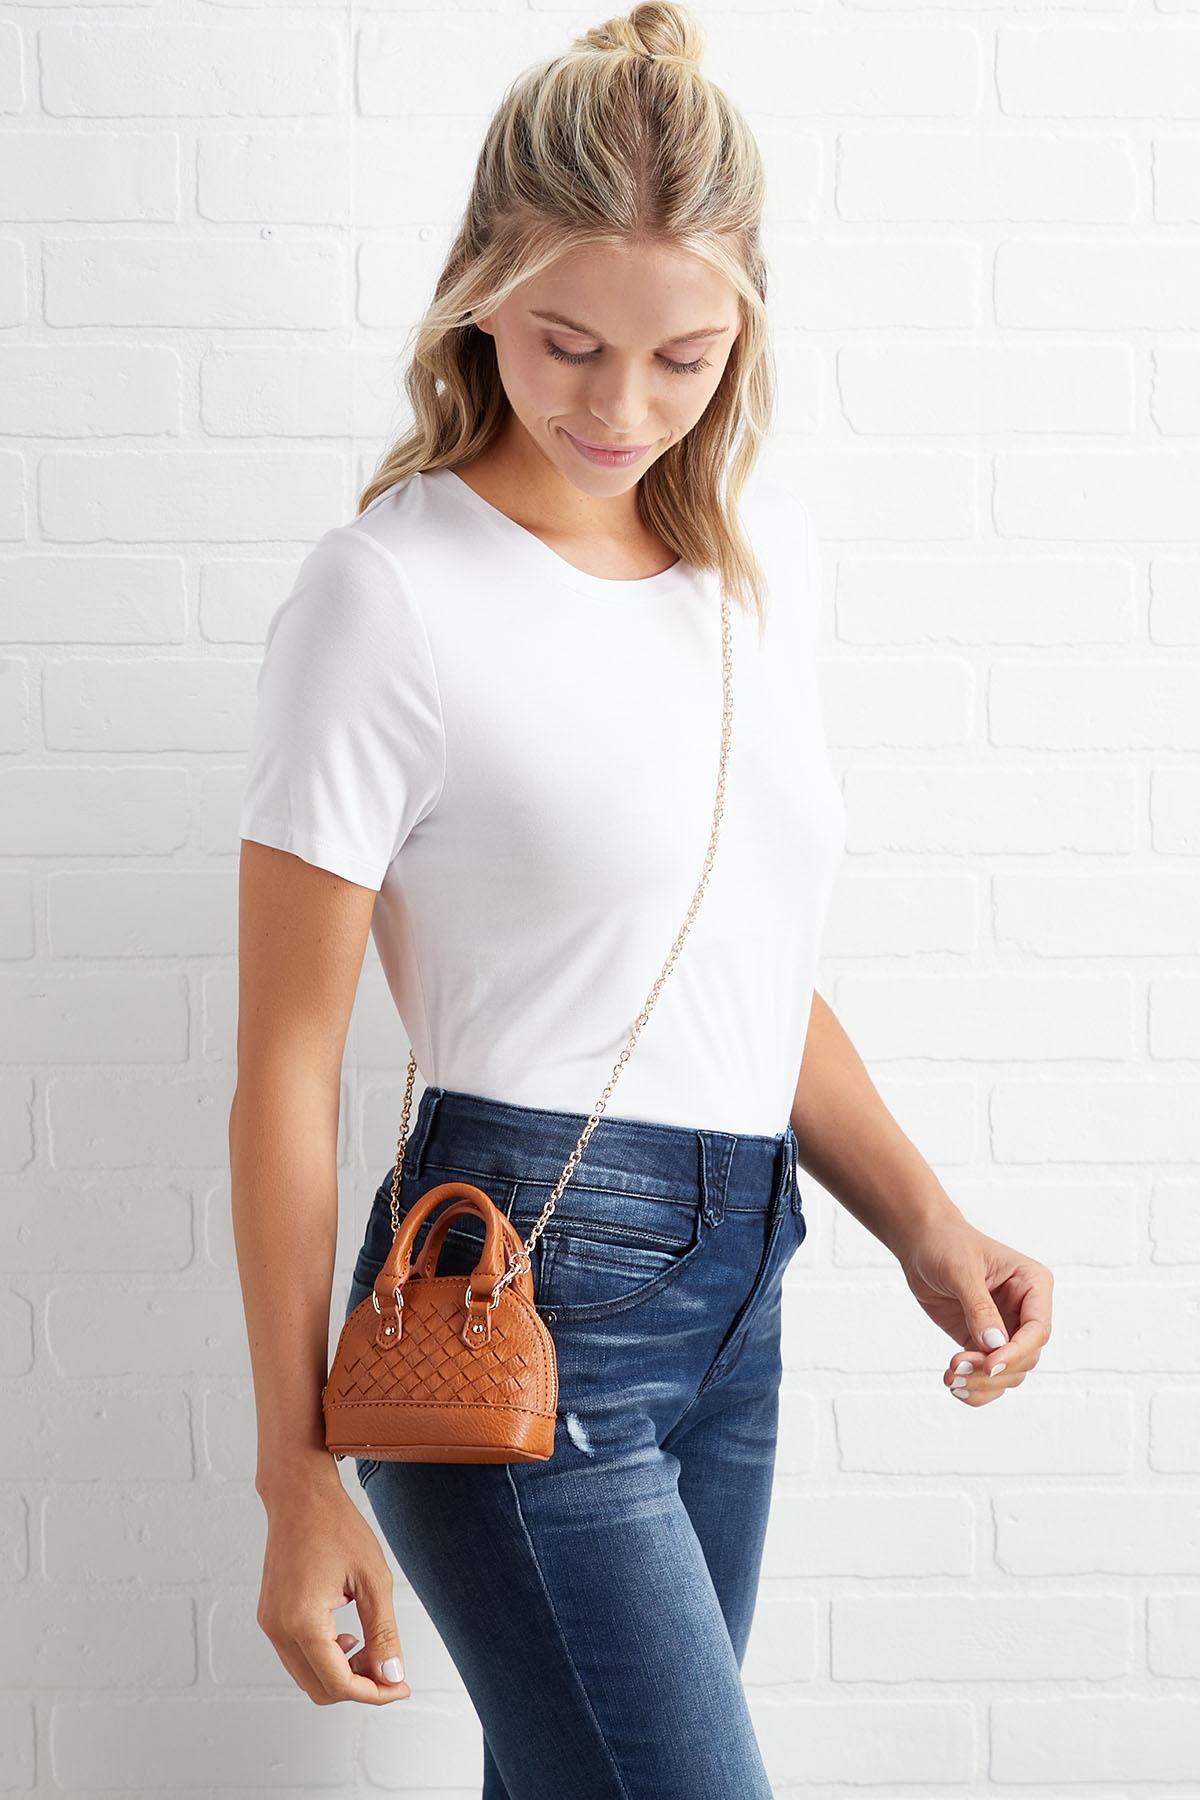 Itty Bitty Mini Bag